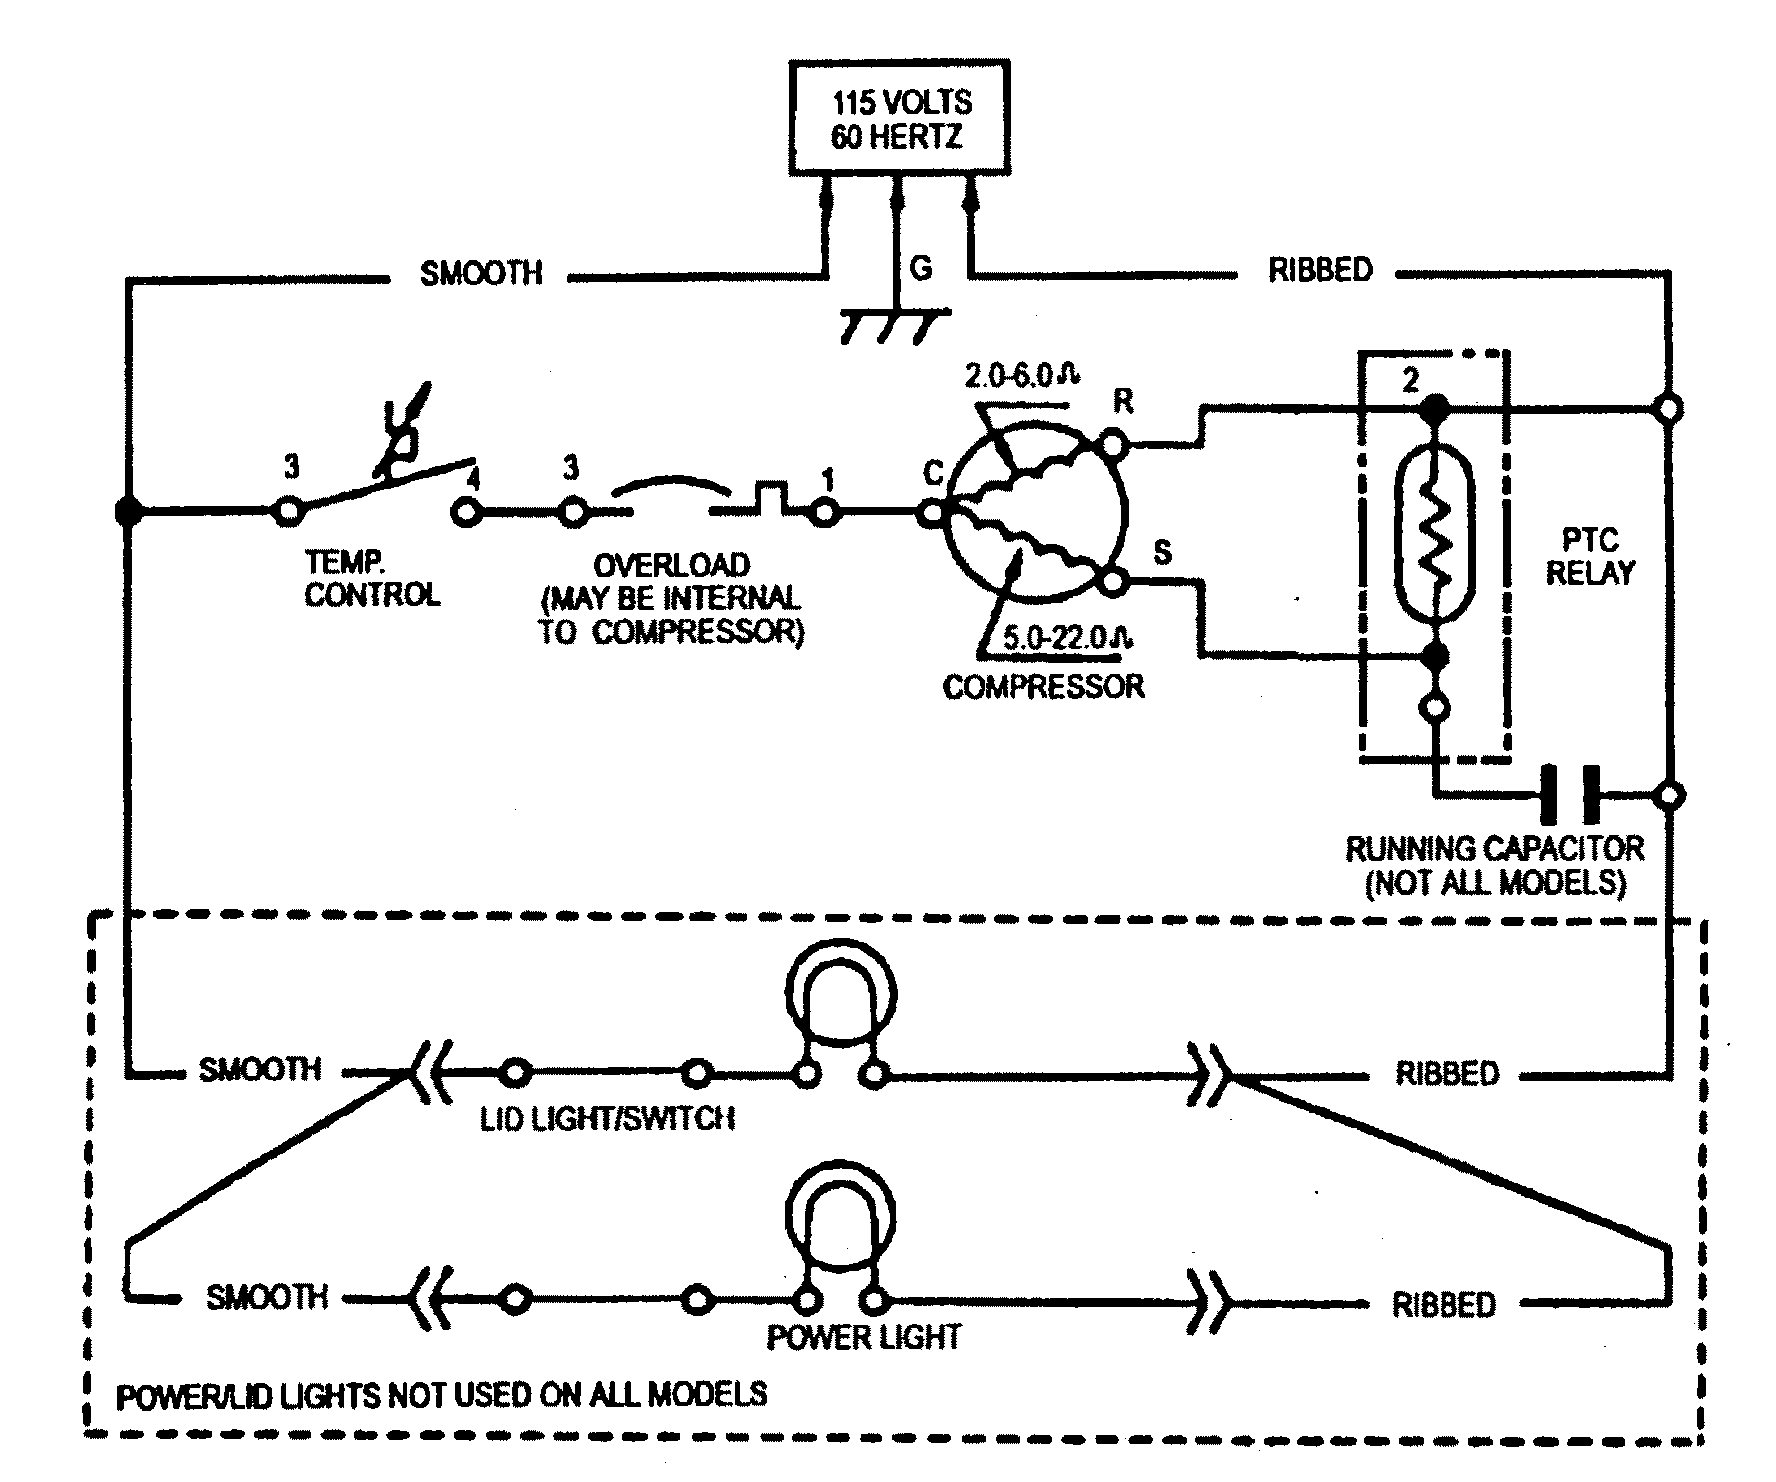 hight resolution of kenmore freezer compressor wiring diagram wiring diagram third level compressor current relay wiring diagram amana model